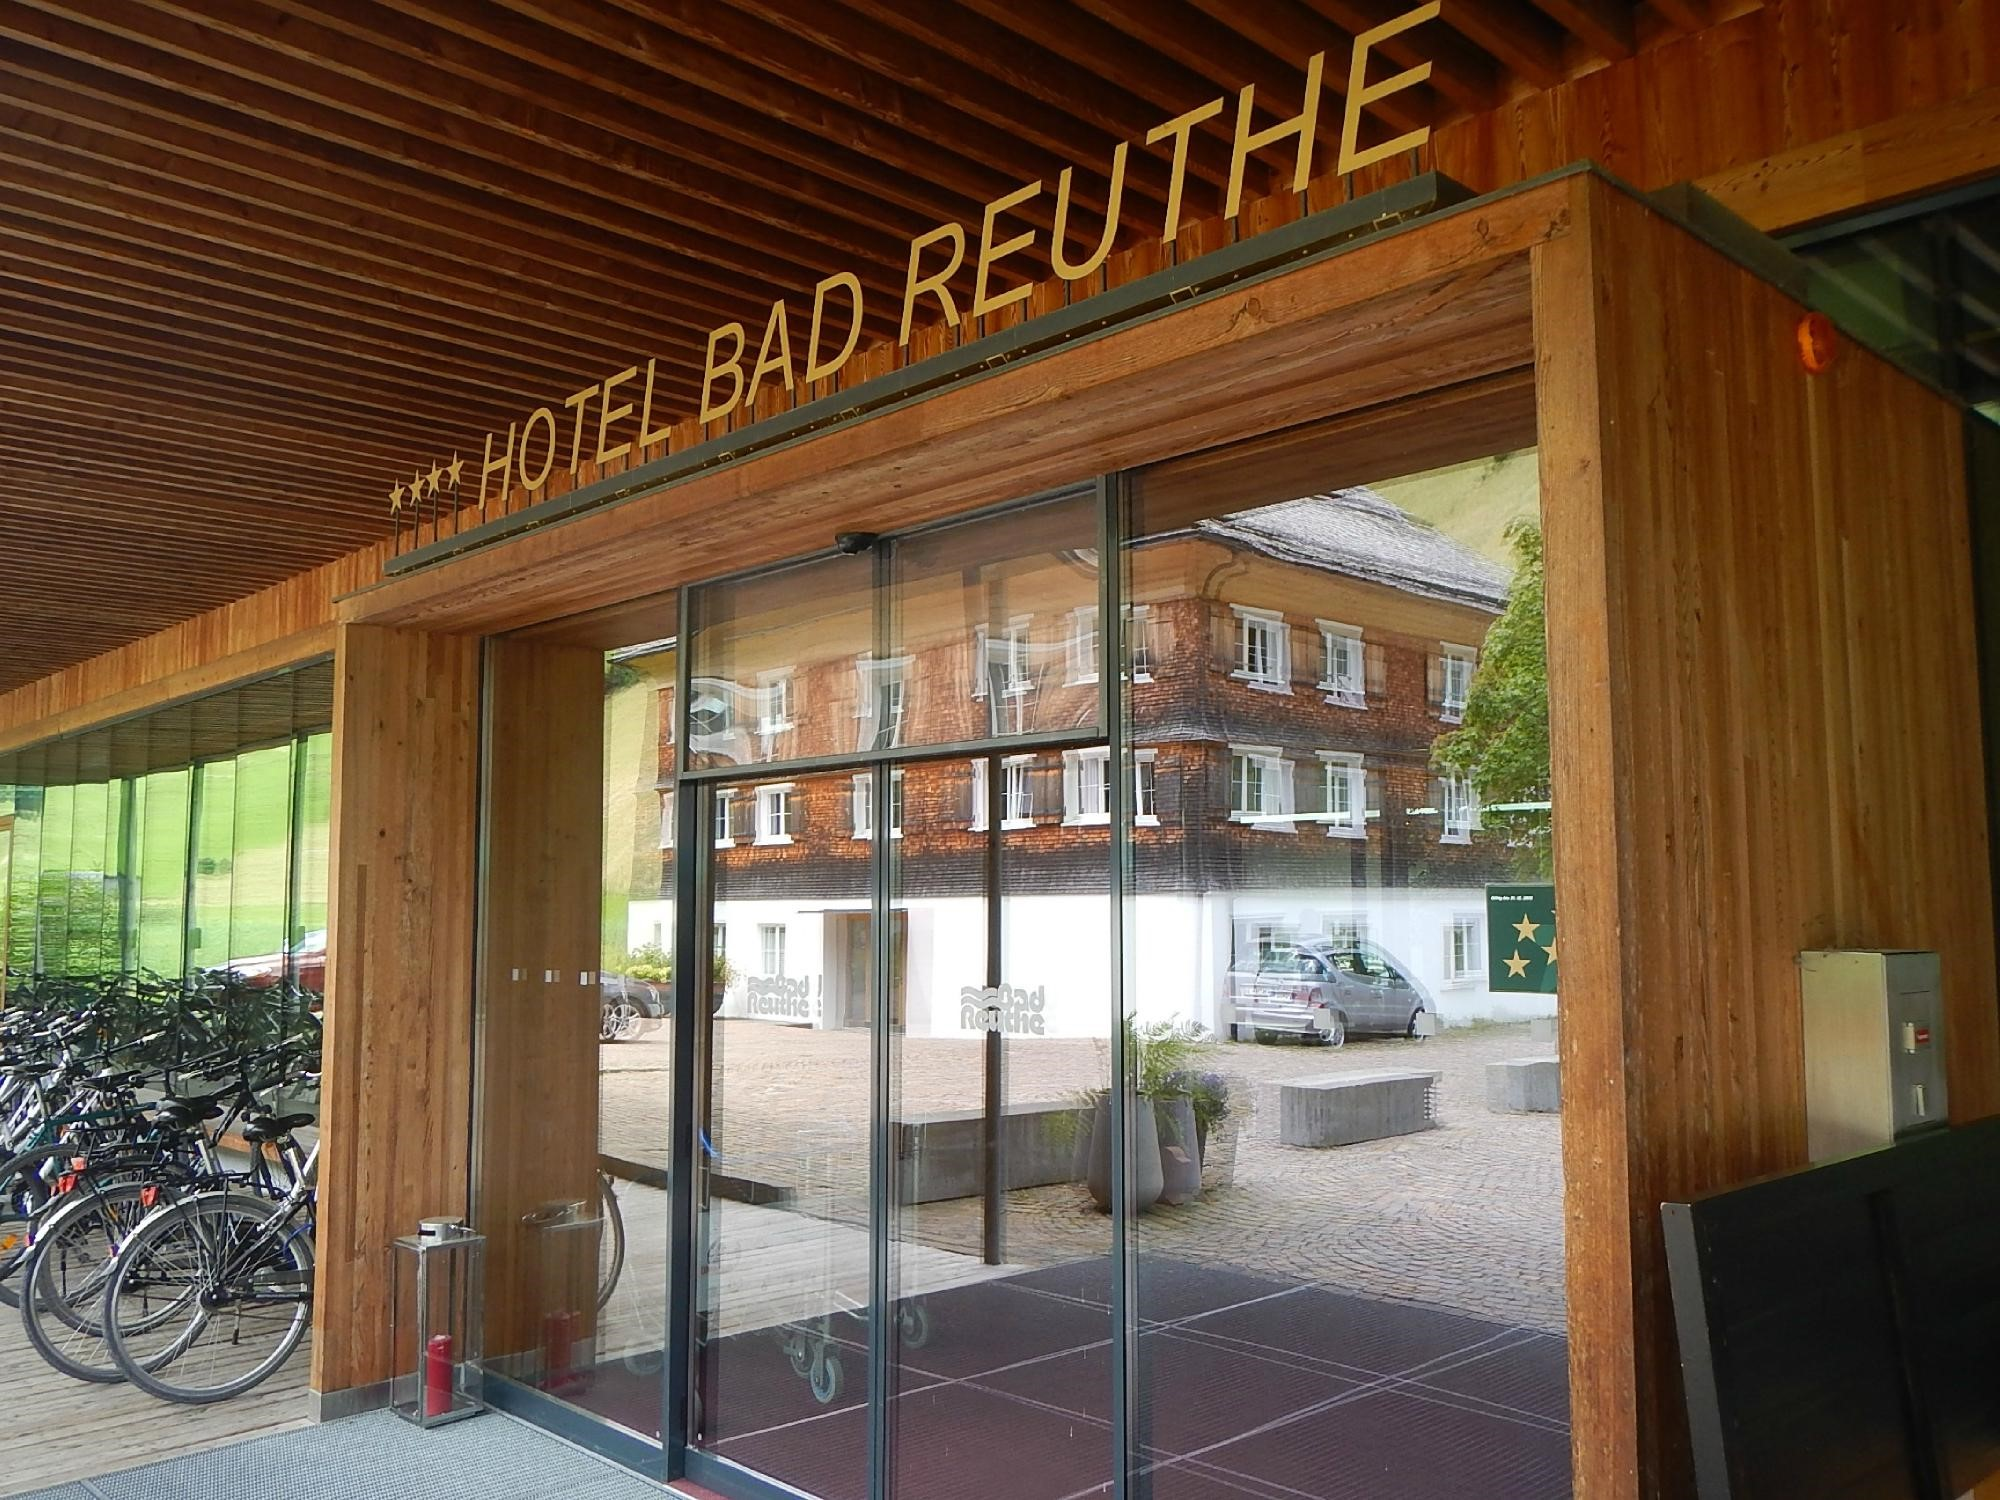 Bad Reuthe